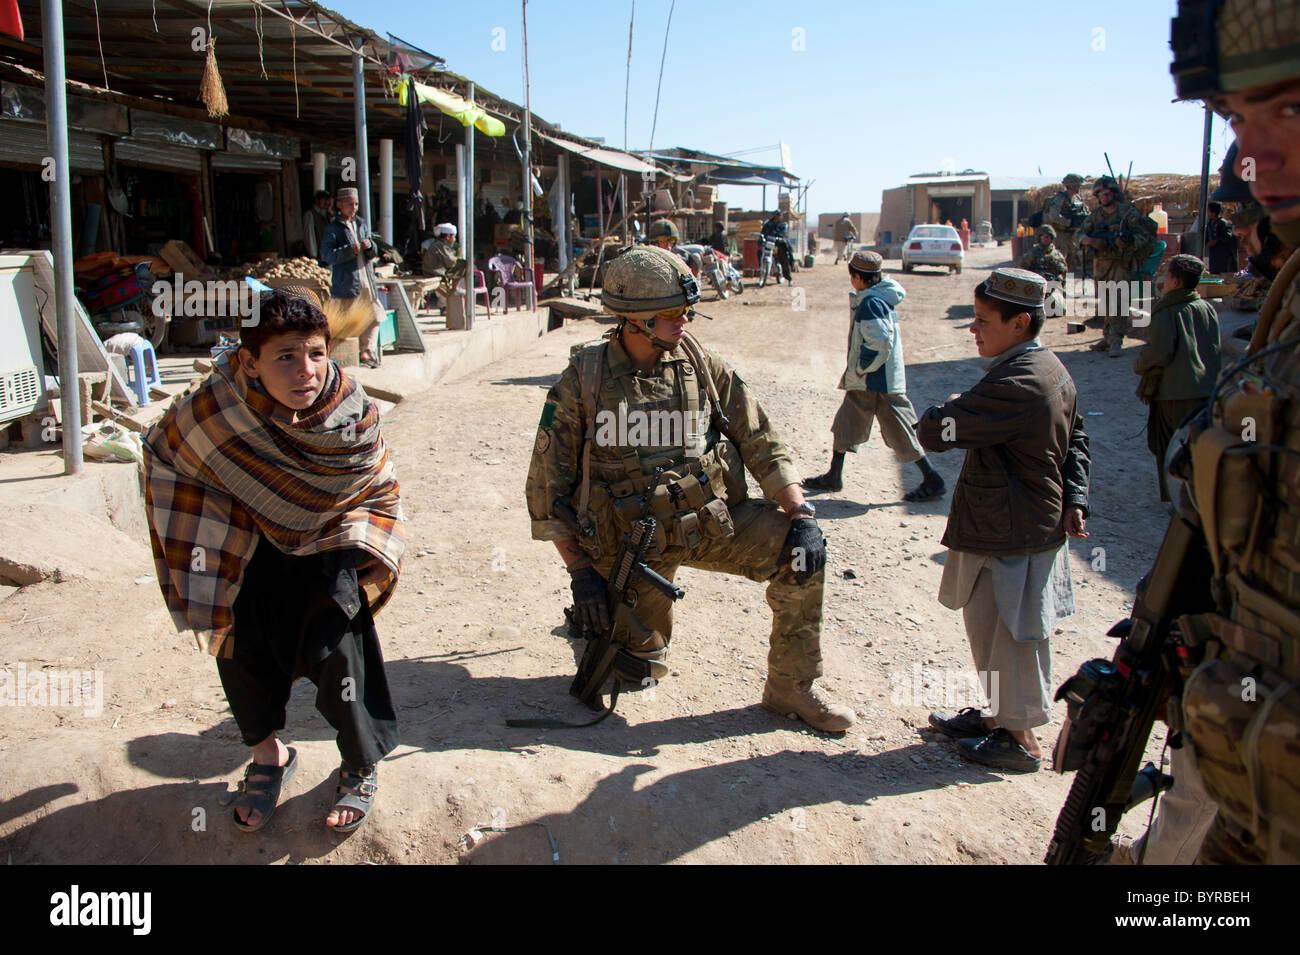 Afghan Bazaar Stock Photos Amp Afghan Bazaar Stock Images